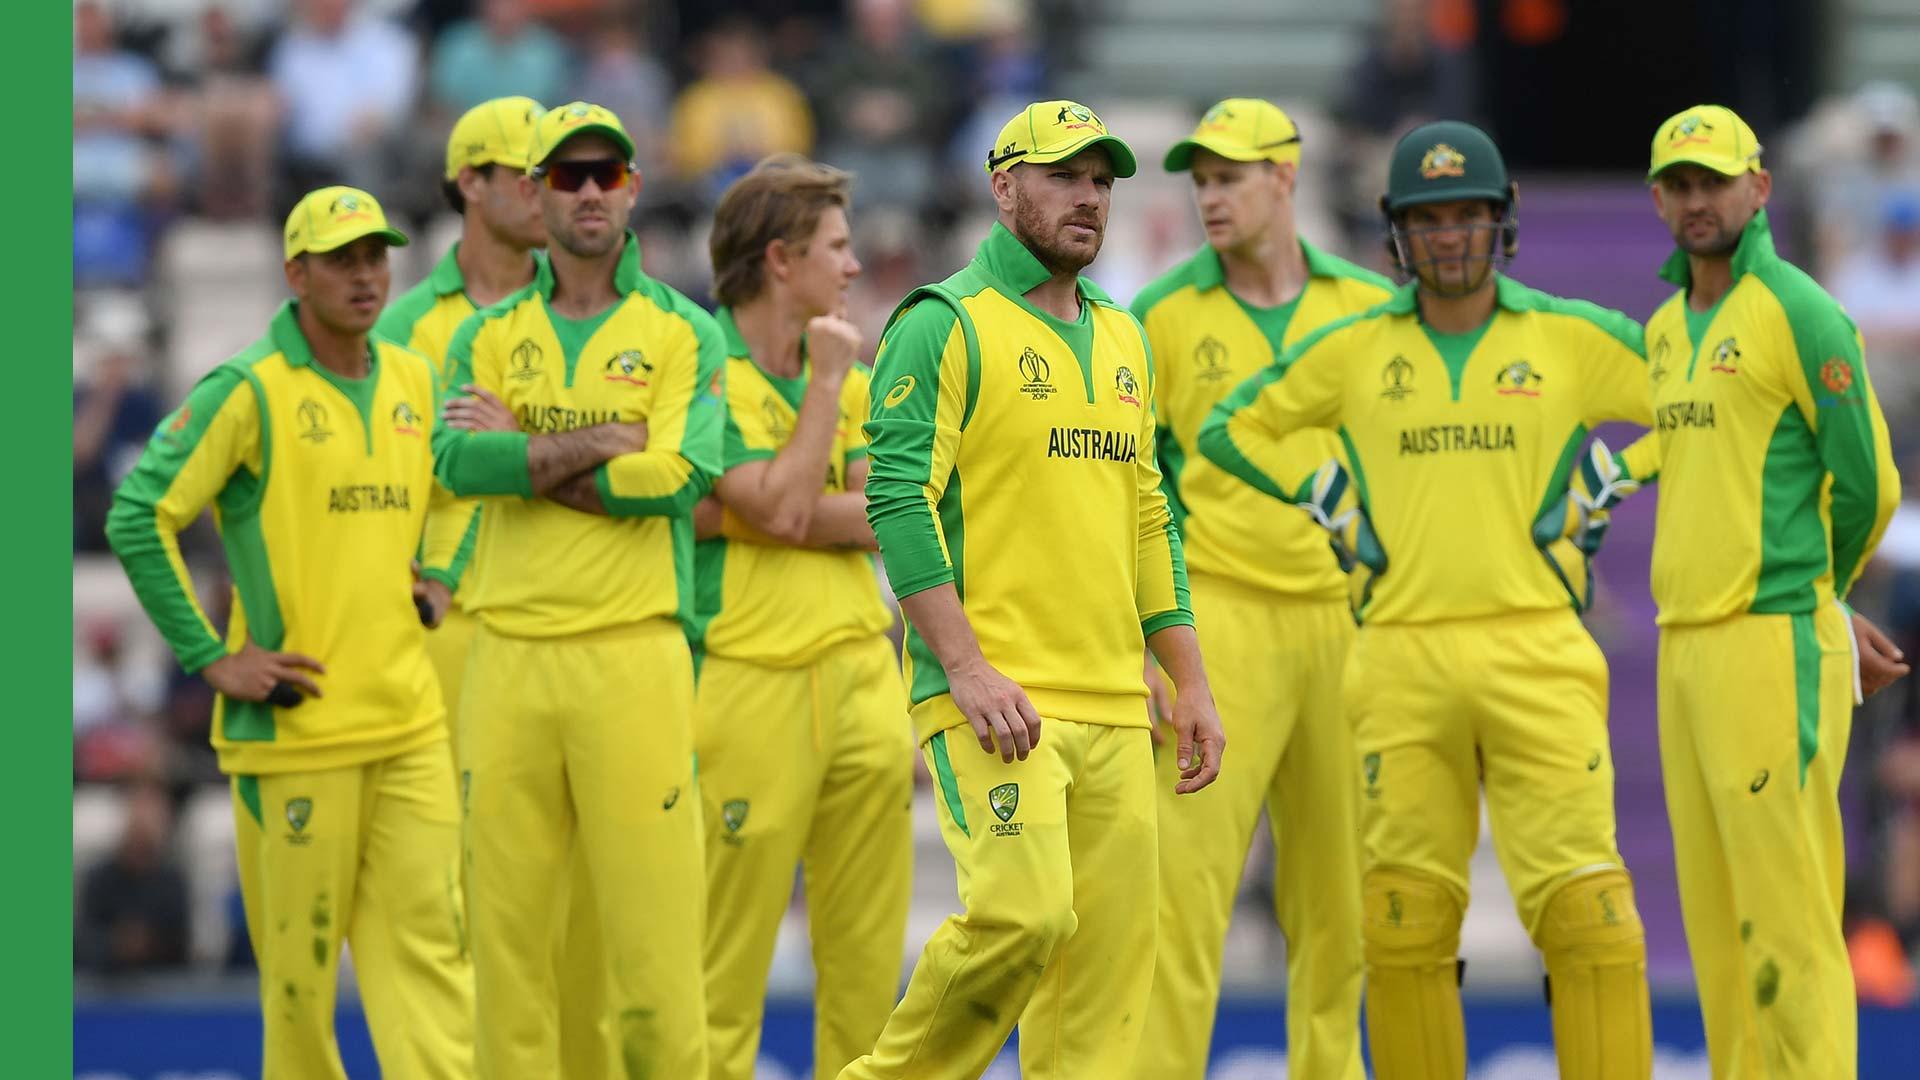 australia team 2019 world cup க்கான பட முடிவு